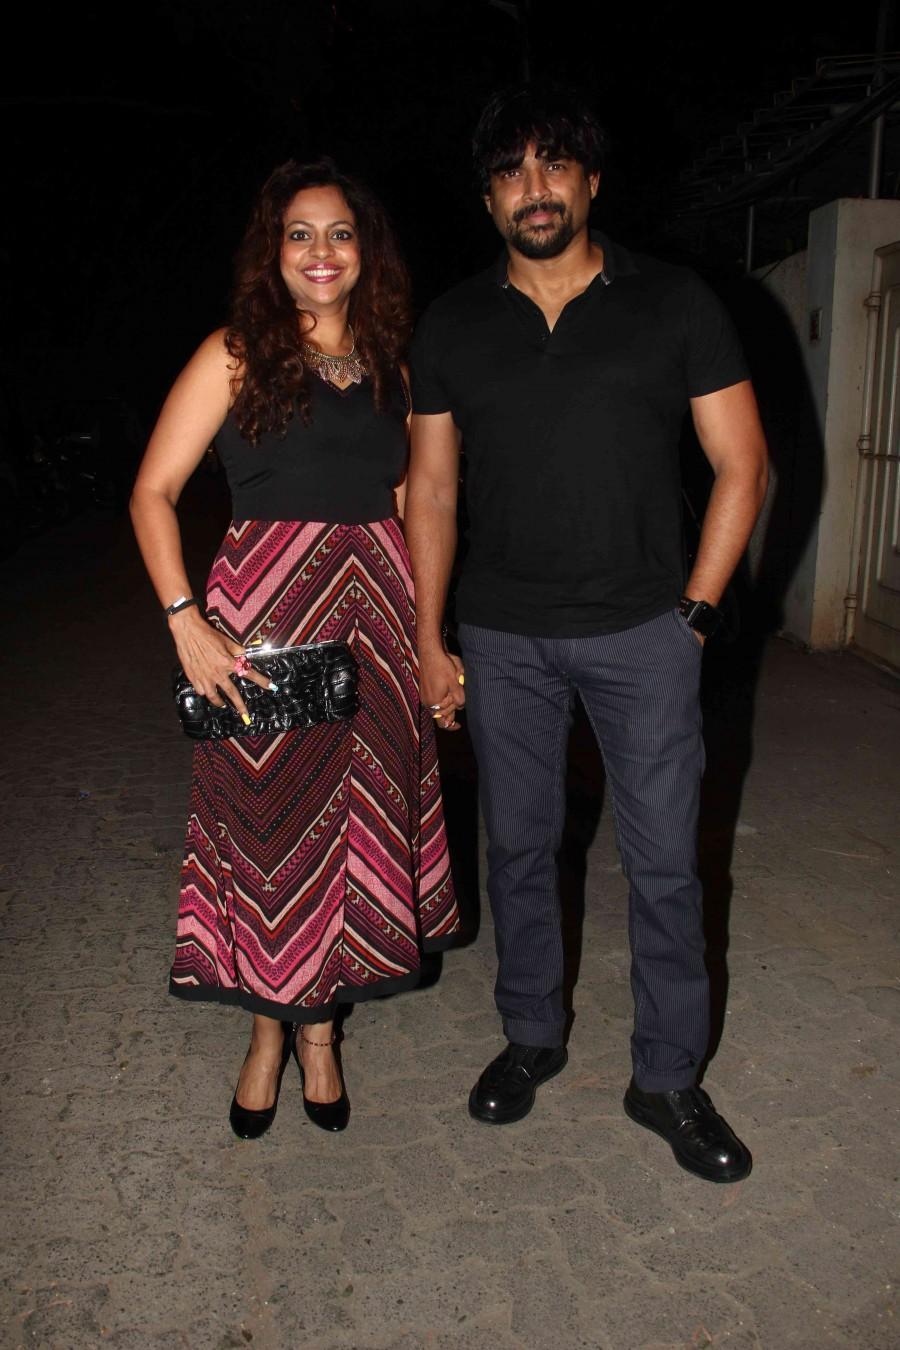 Tanu Weds Manu Returns,Tanu Weds Manu Returns photos,Tanu Weds Manu Returns success bash,Bollywood celebs photos,Kangana Ranaut,Madhavan,Radhika apte